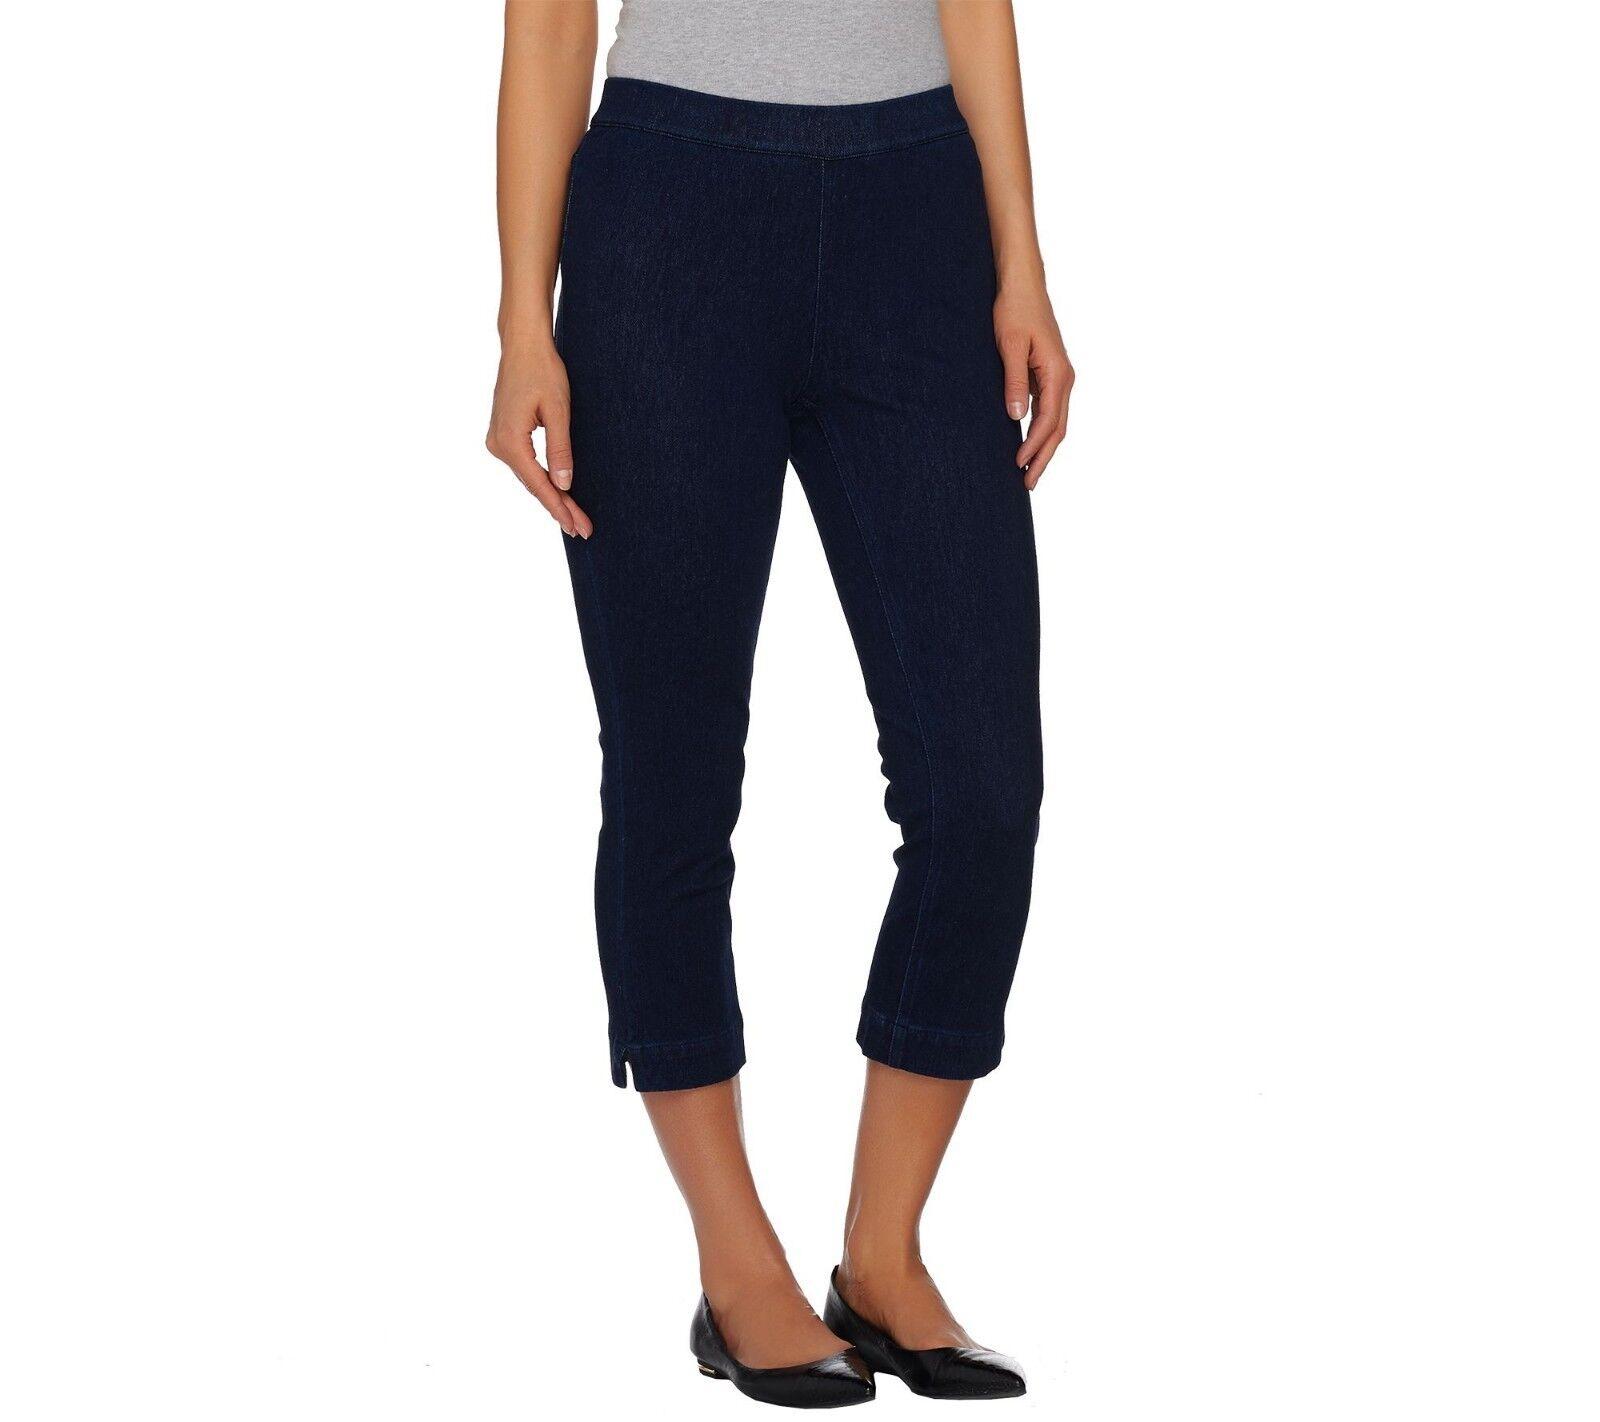 Isaac Mizrahi Petite Knit Denim Pull-on Crop Jeans Pant Dark Indigo 18WP Sz QVC